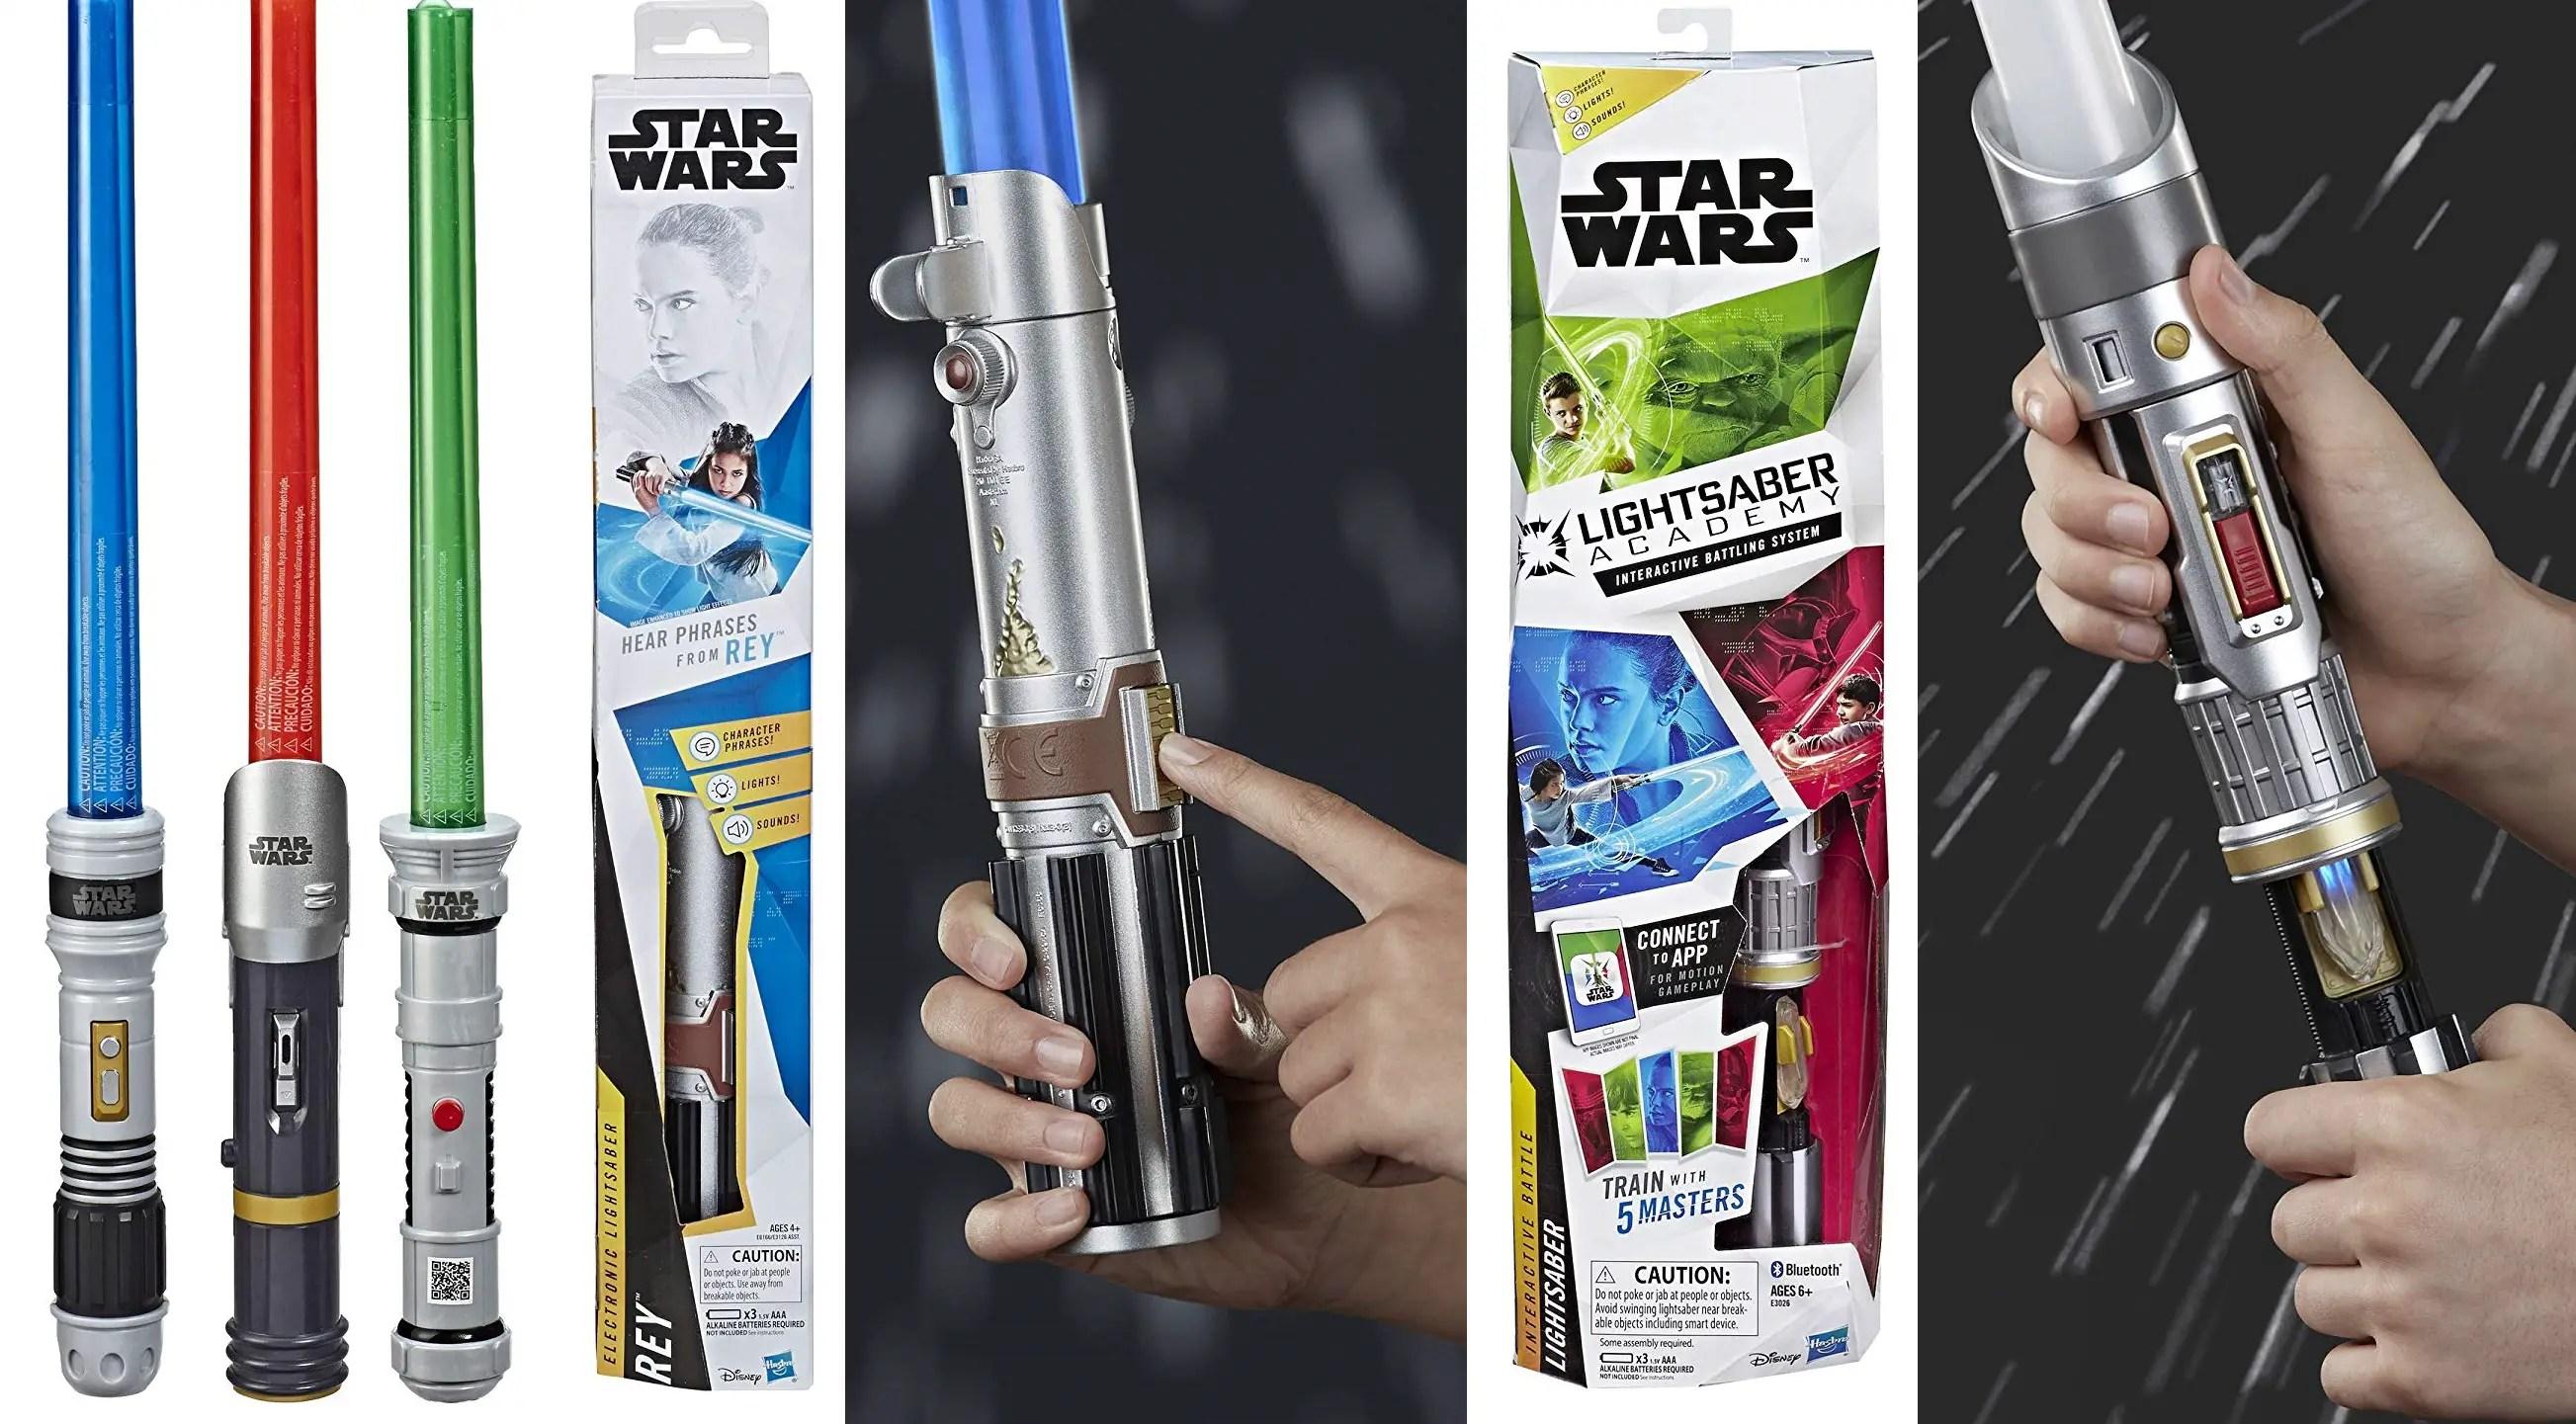 Disney Parks Star Wars Extendable Light Saber Jedi Training Academy Blue New